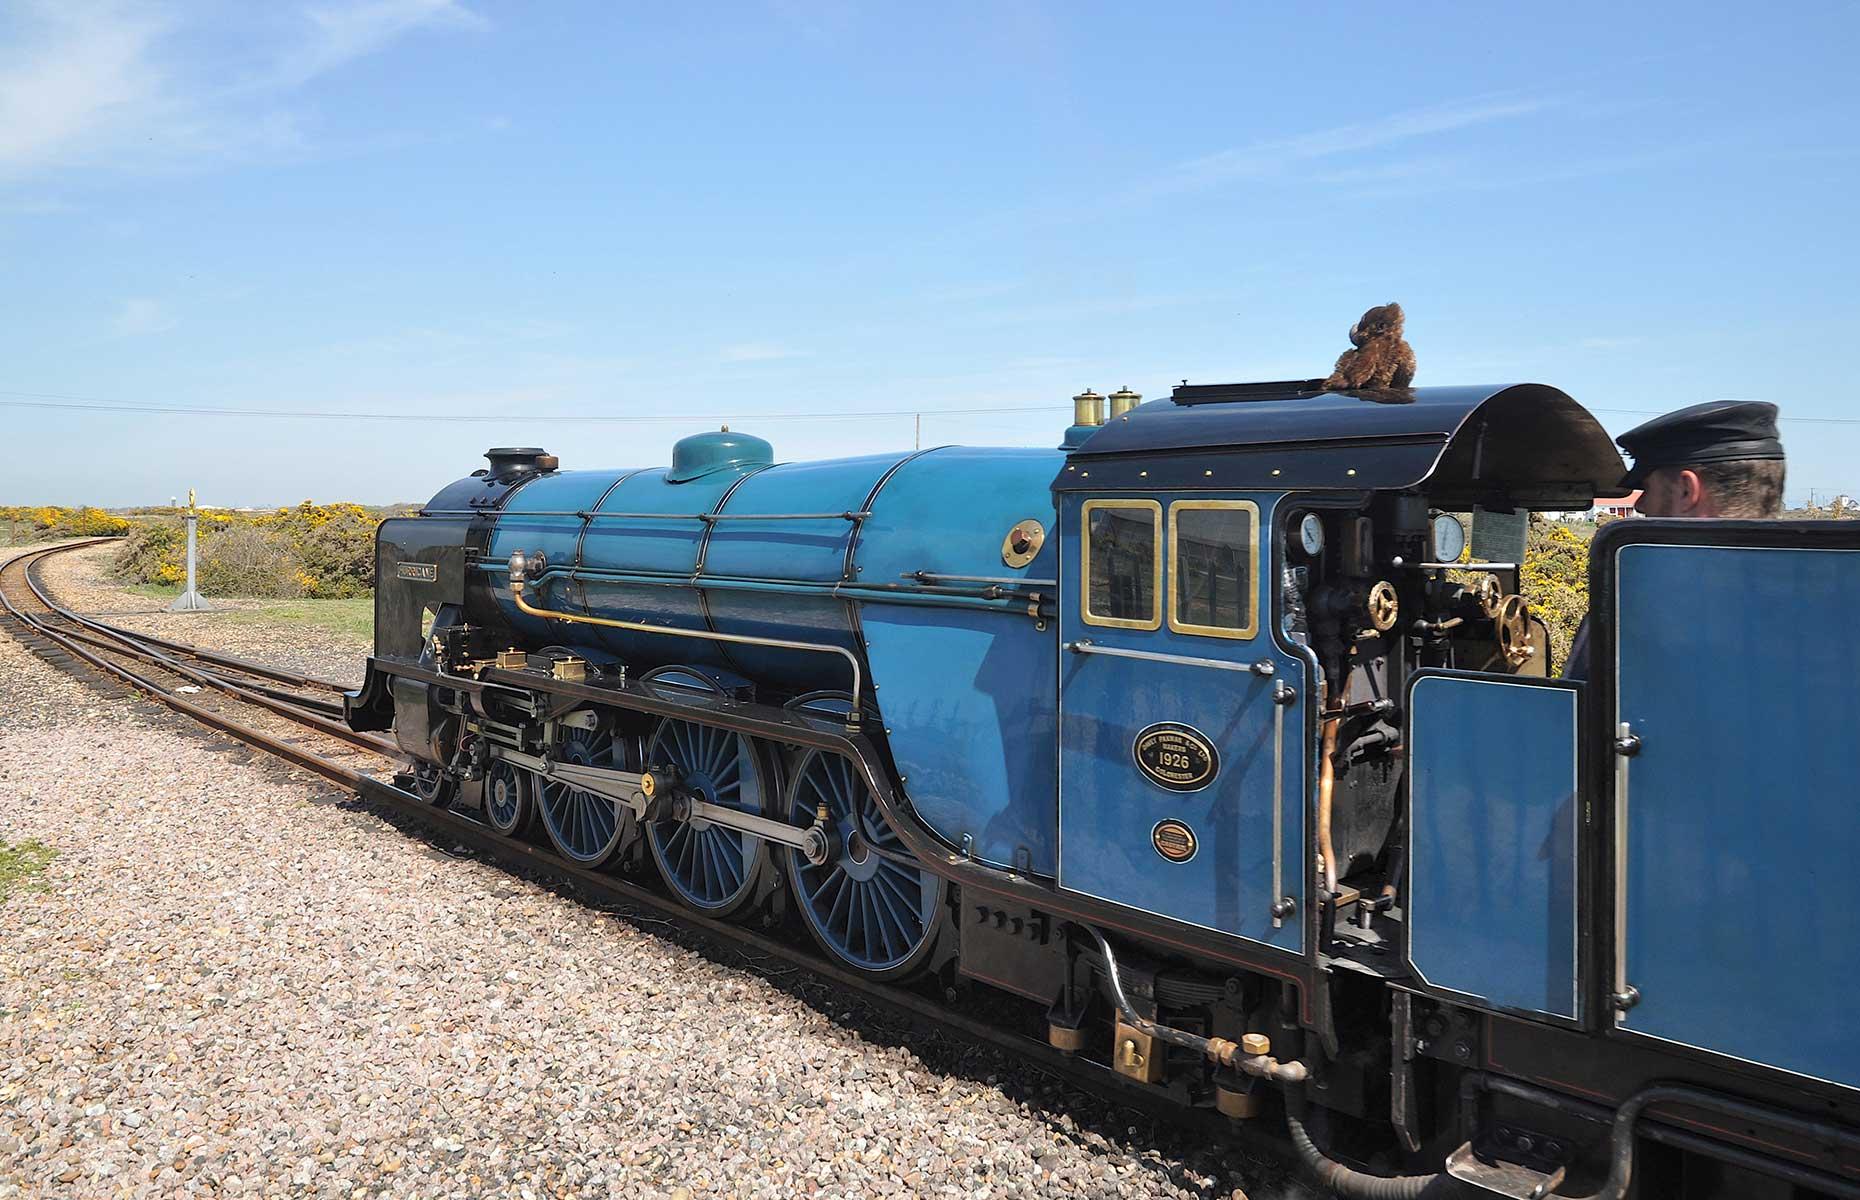 Romney, Hythe and Dymchurch Railway, Kent (Image: Ron Ellis/Shutterstock)